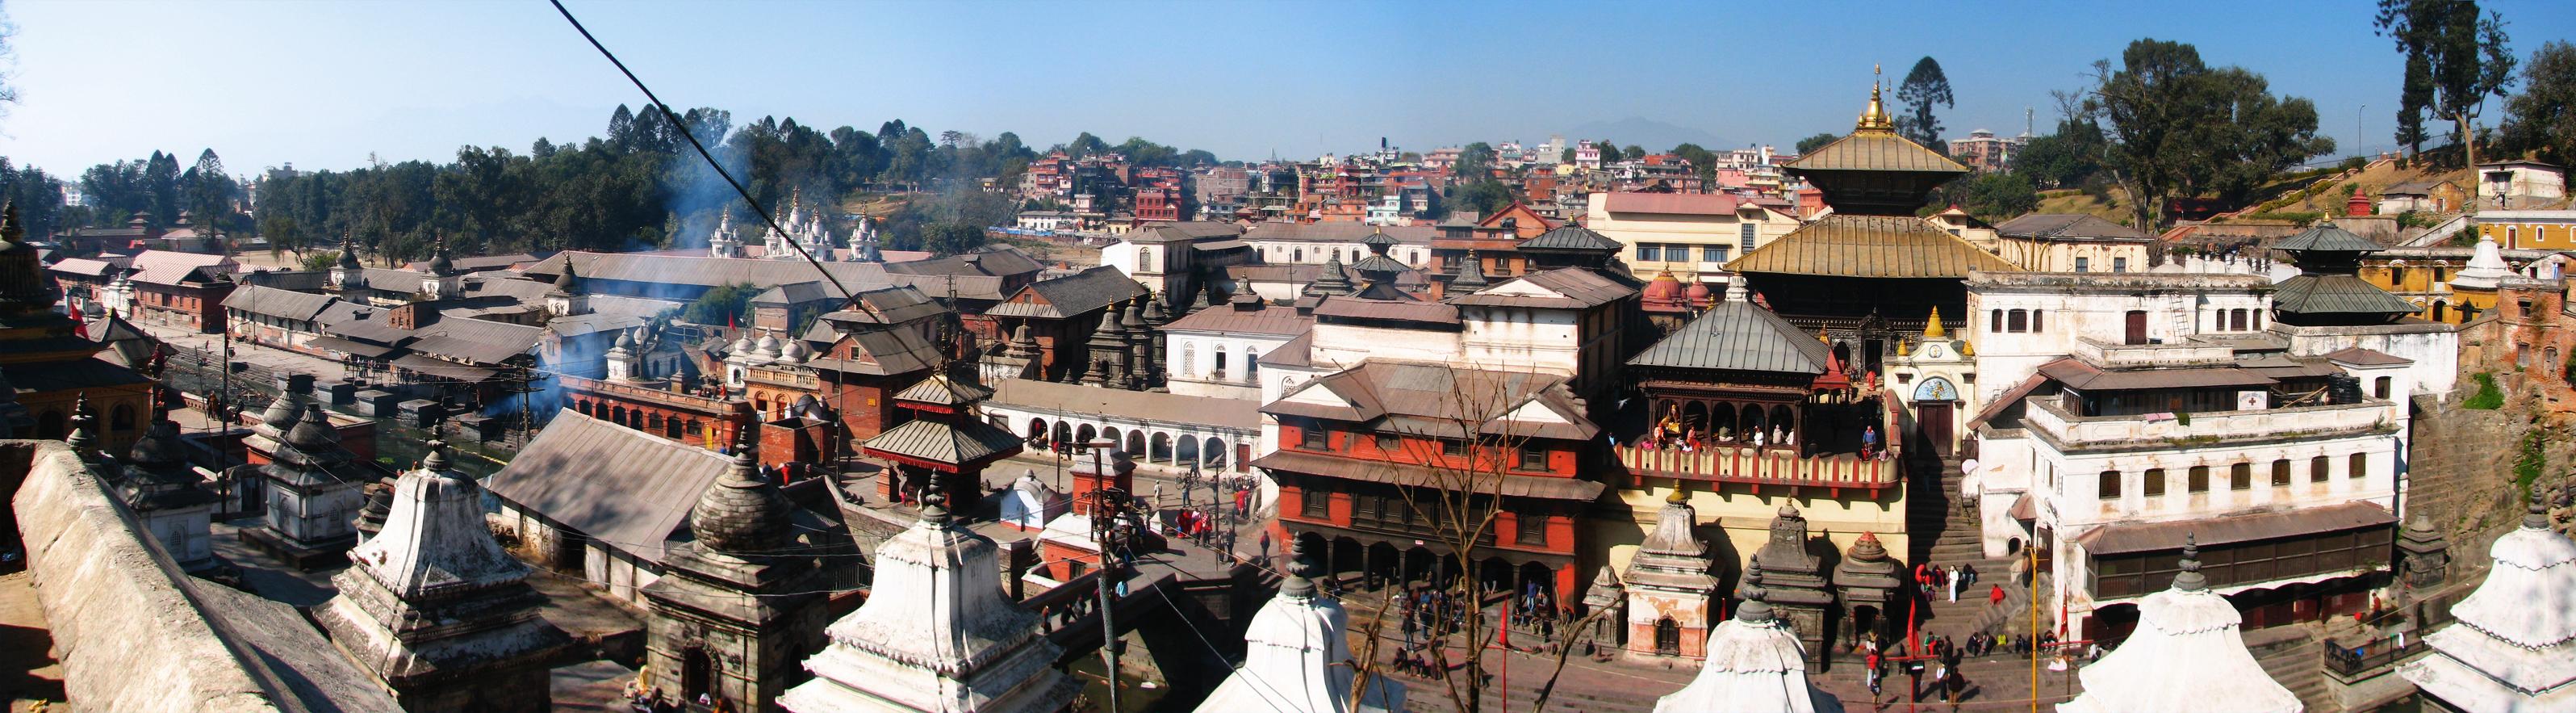 Kathmandu Population 2019 (Demographics, Maps, Graphs)